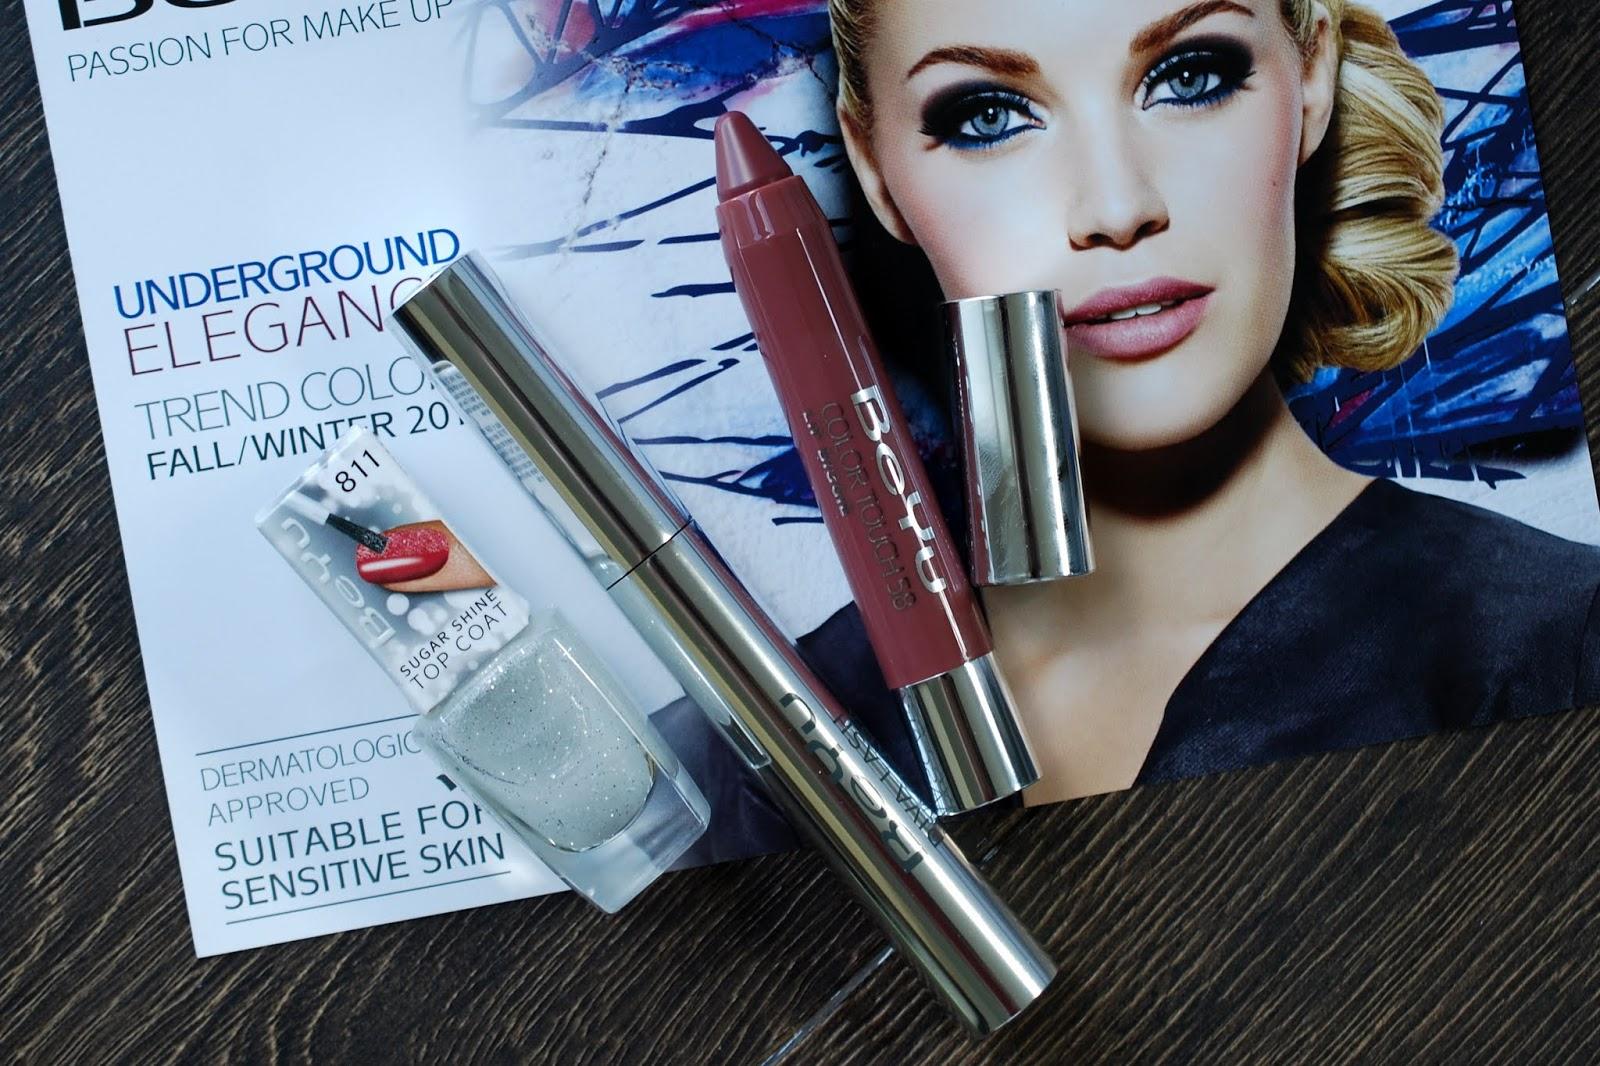 Beauty News BeYu Underground Elegance Trend Colors Fall / Winter 2014